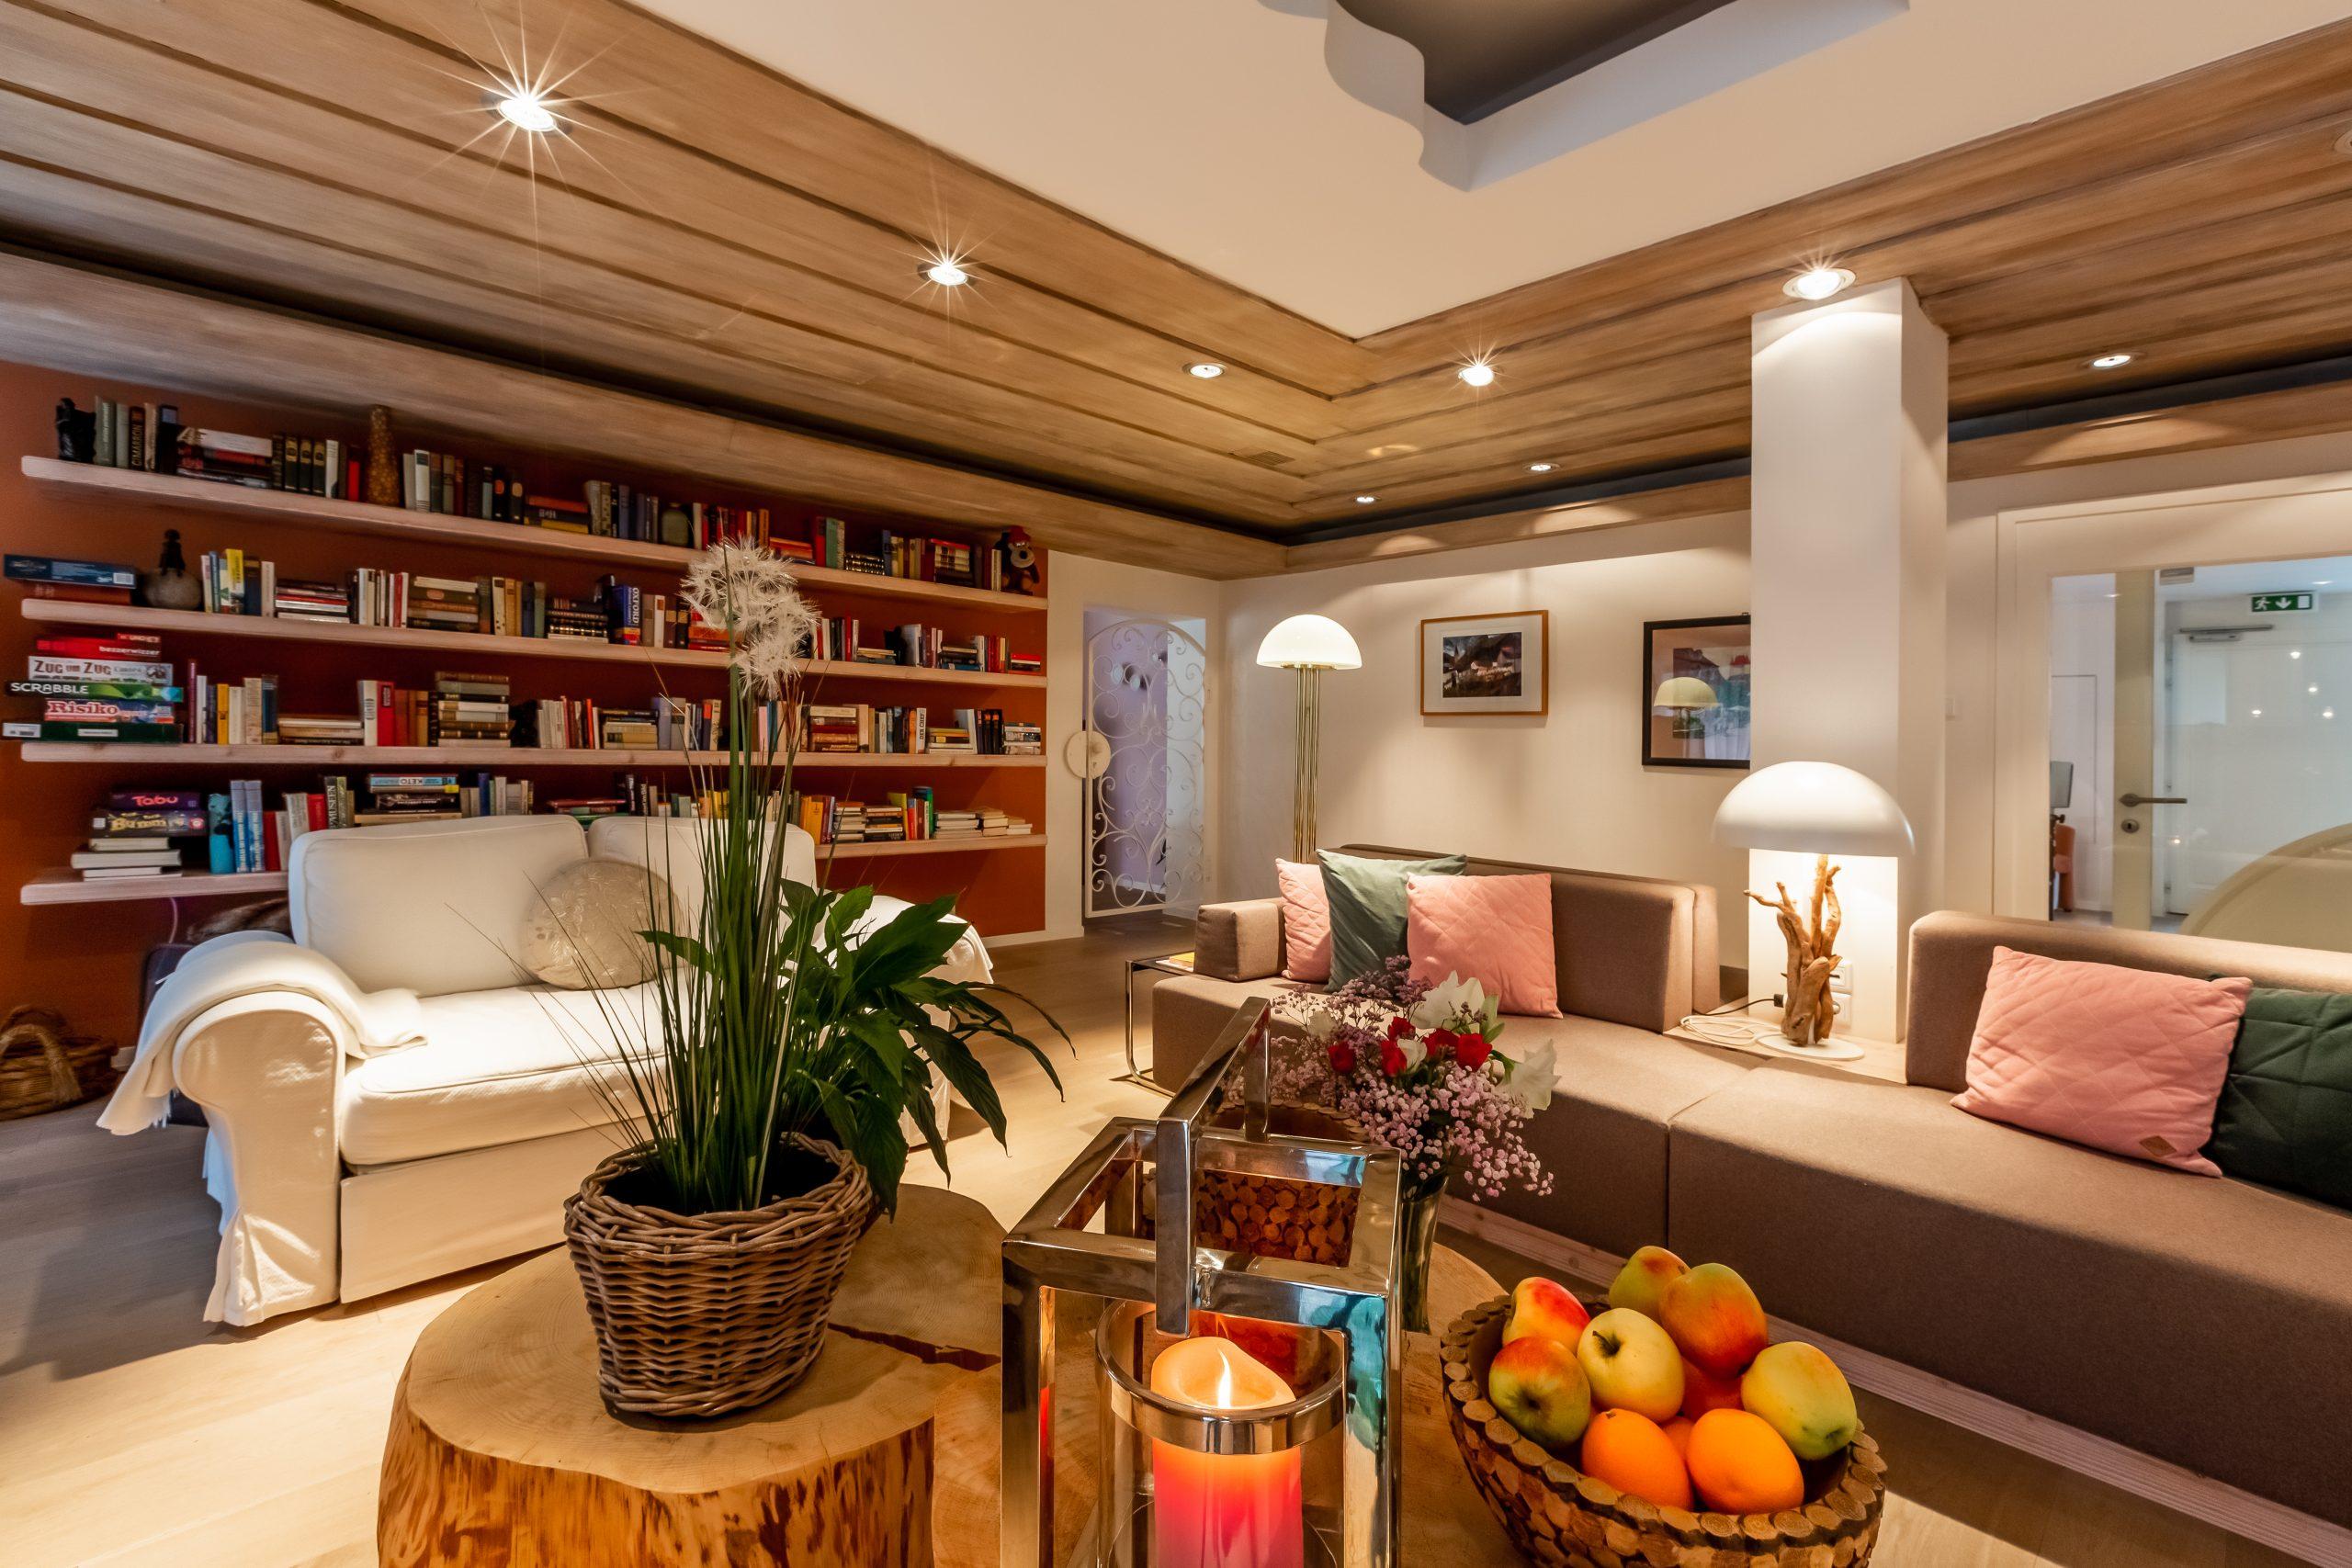 Kaminzimmer Hotel Villa Lago Tegernsee